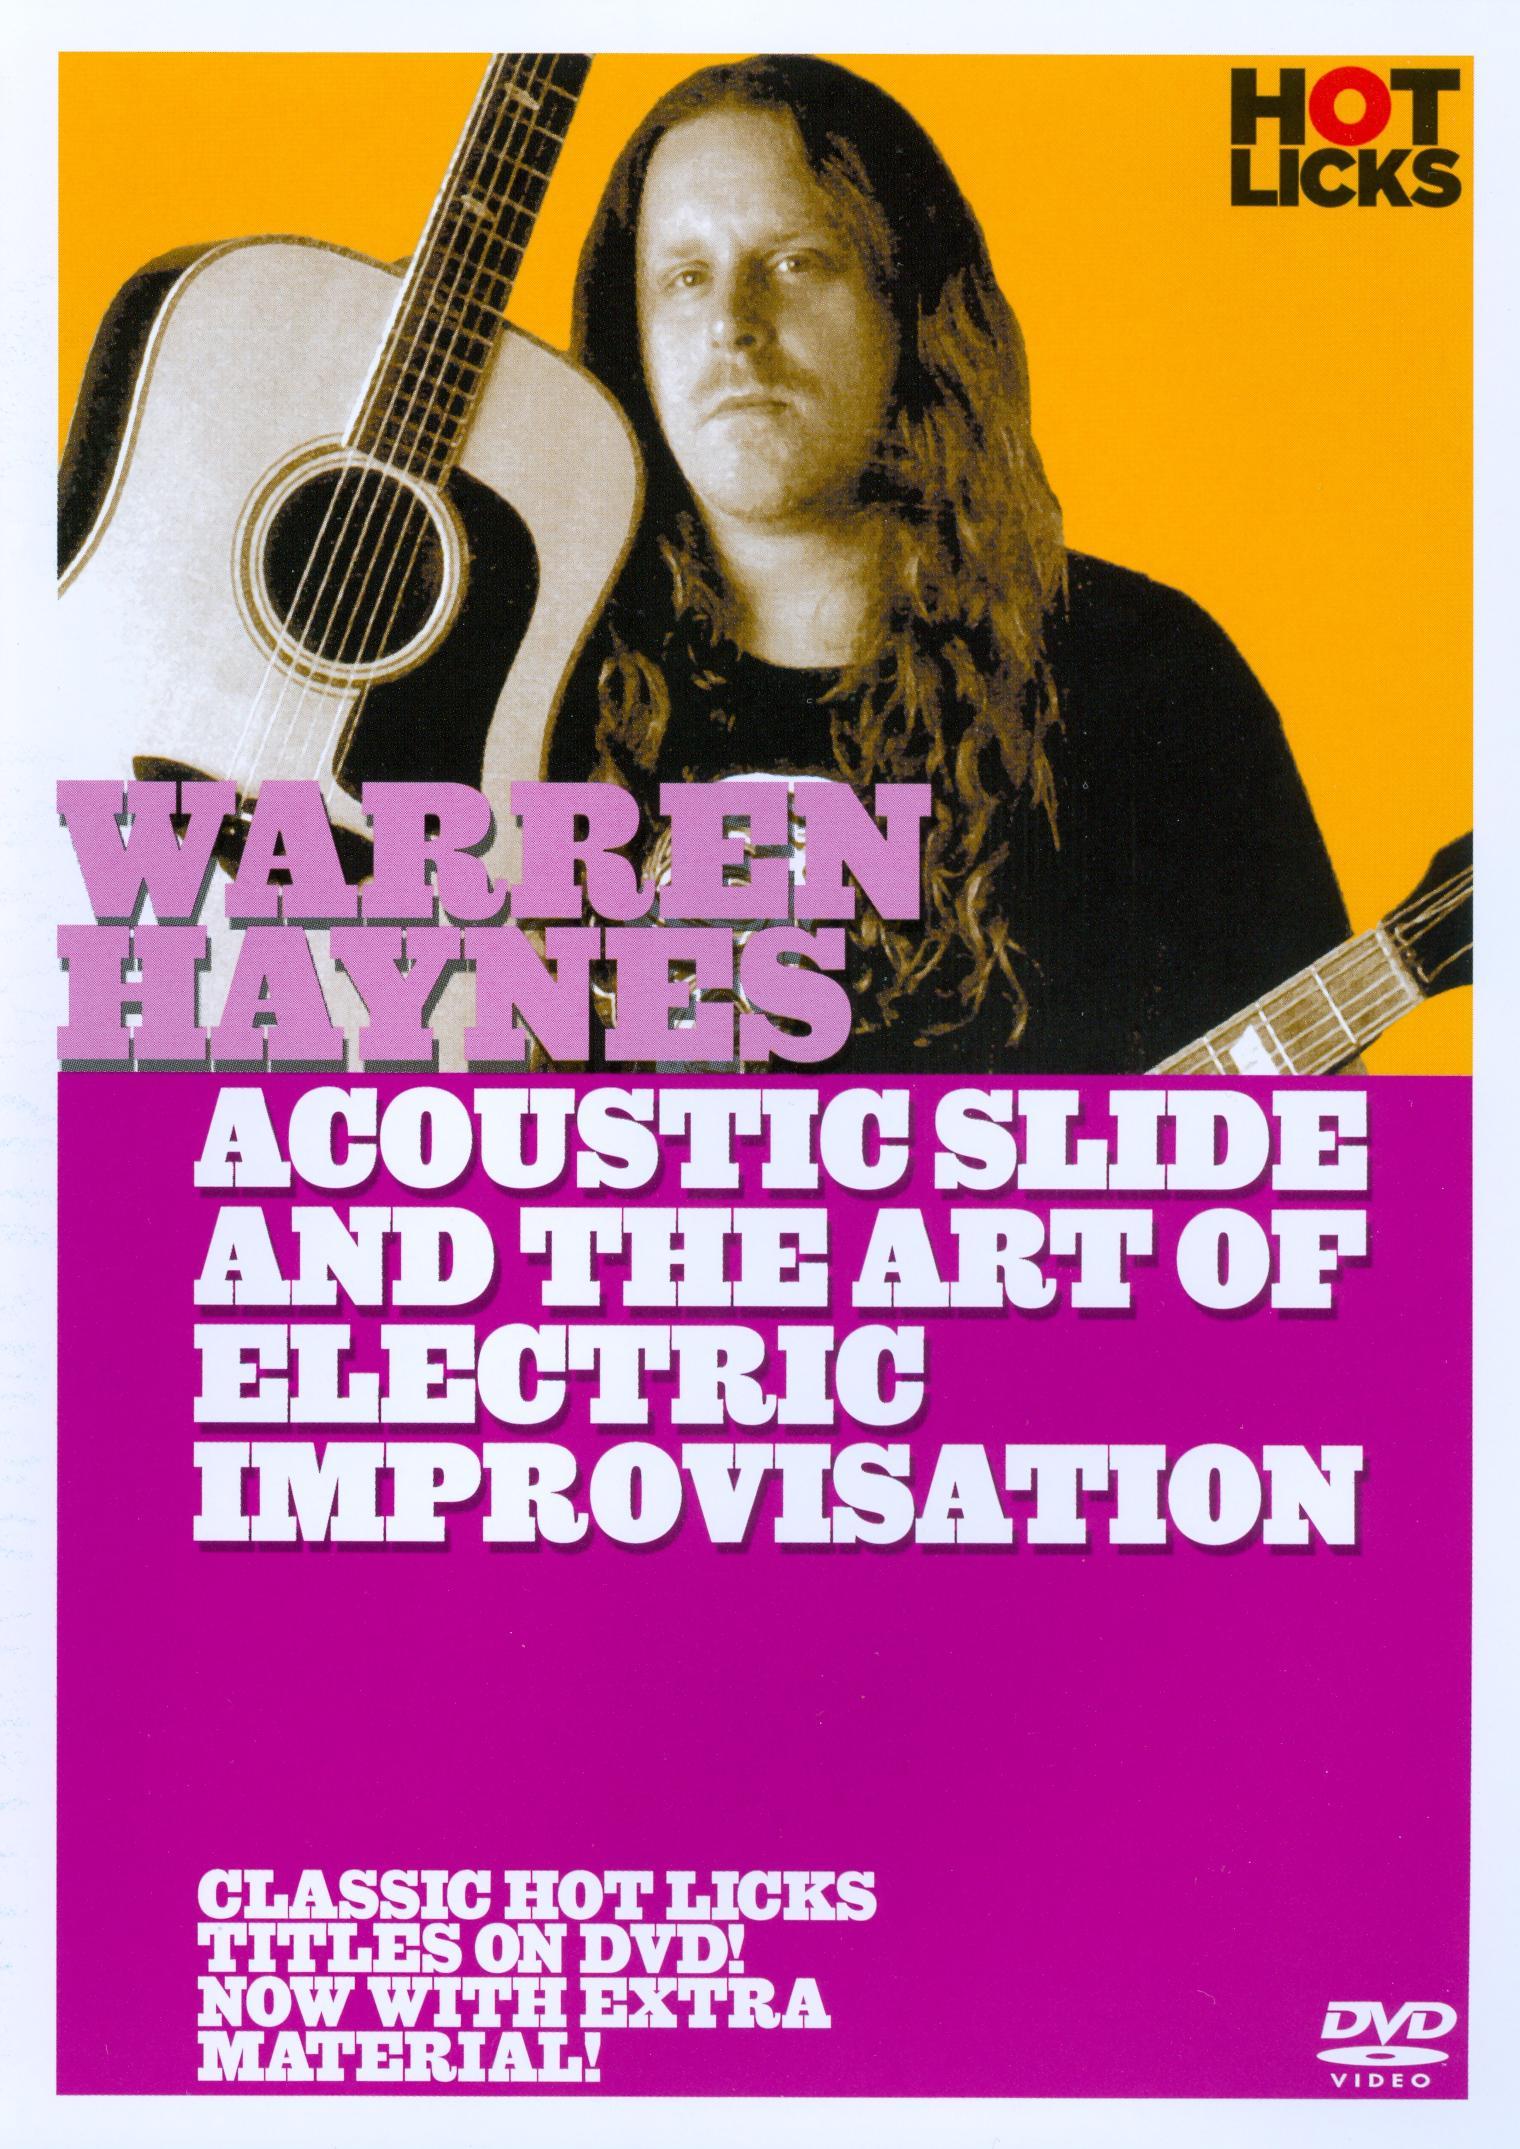 Warren Haynes 2: Acoustic Slide and the art of Electric Improvisation